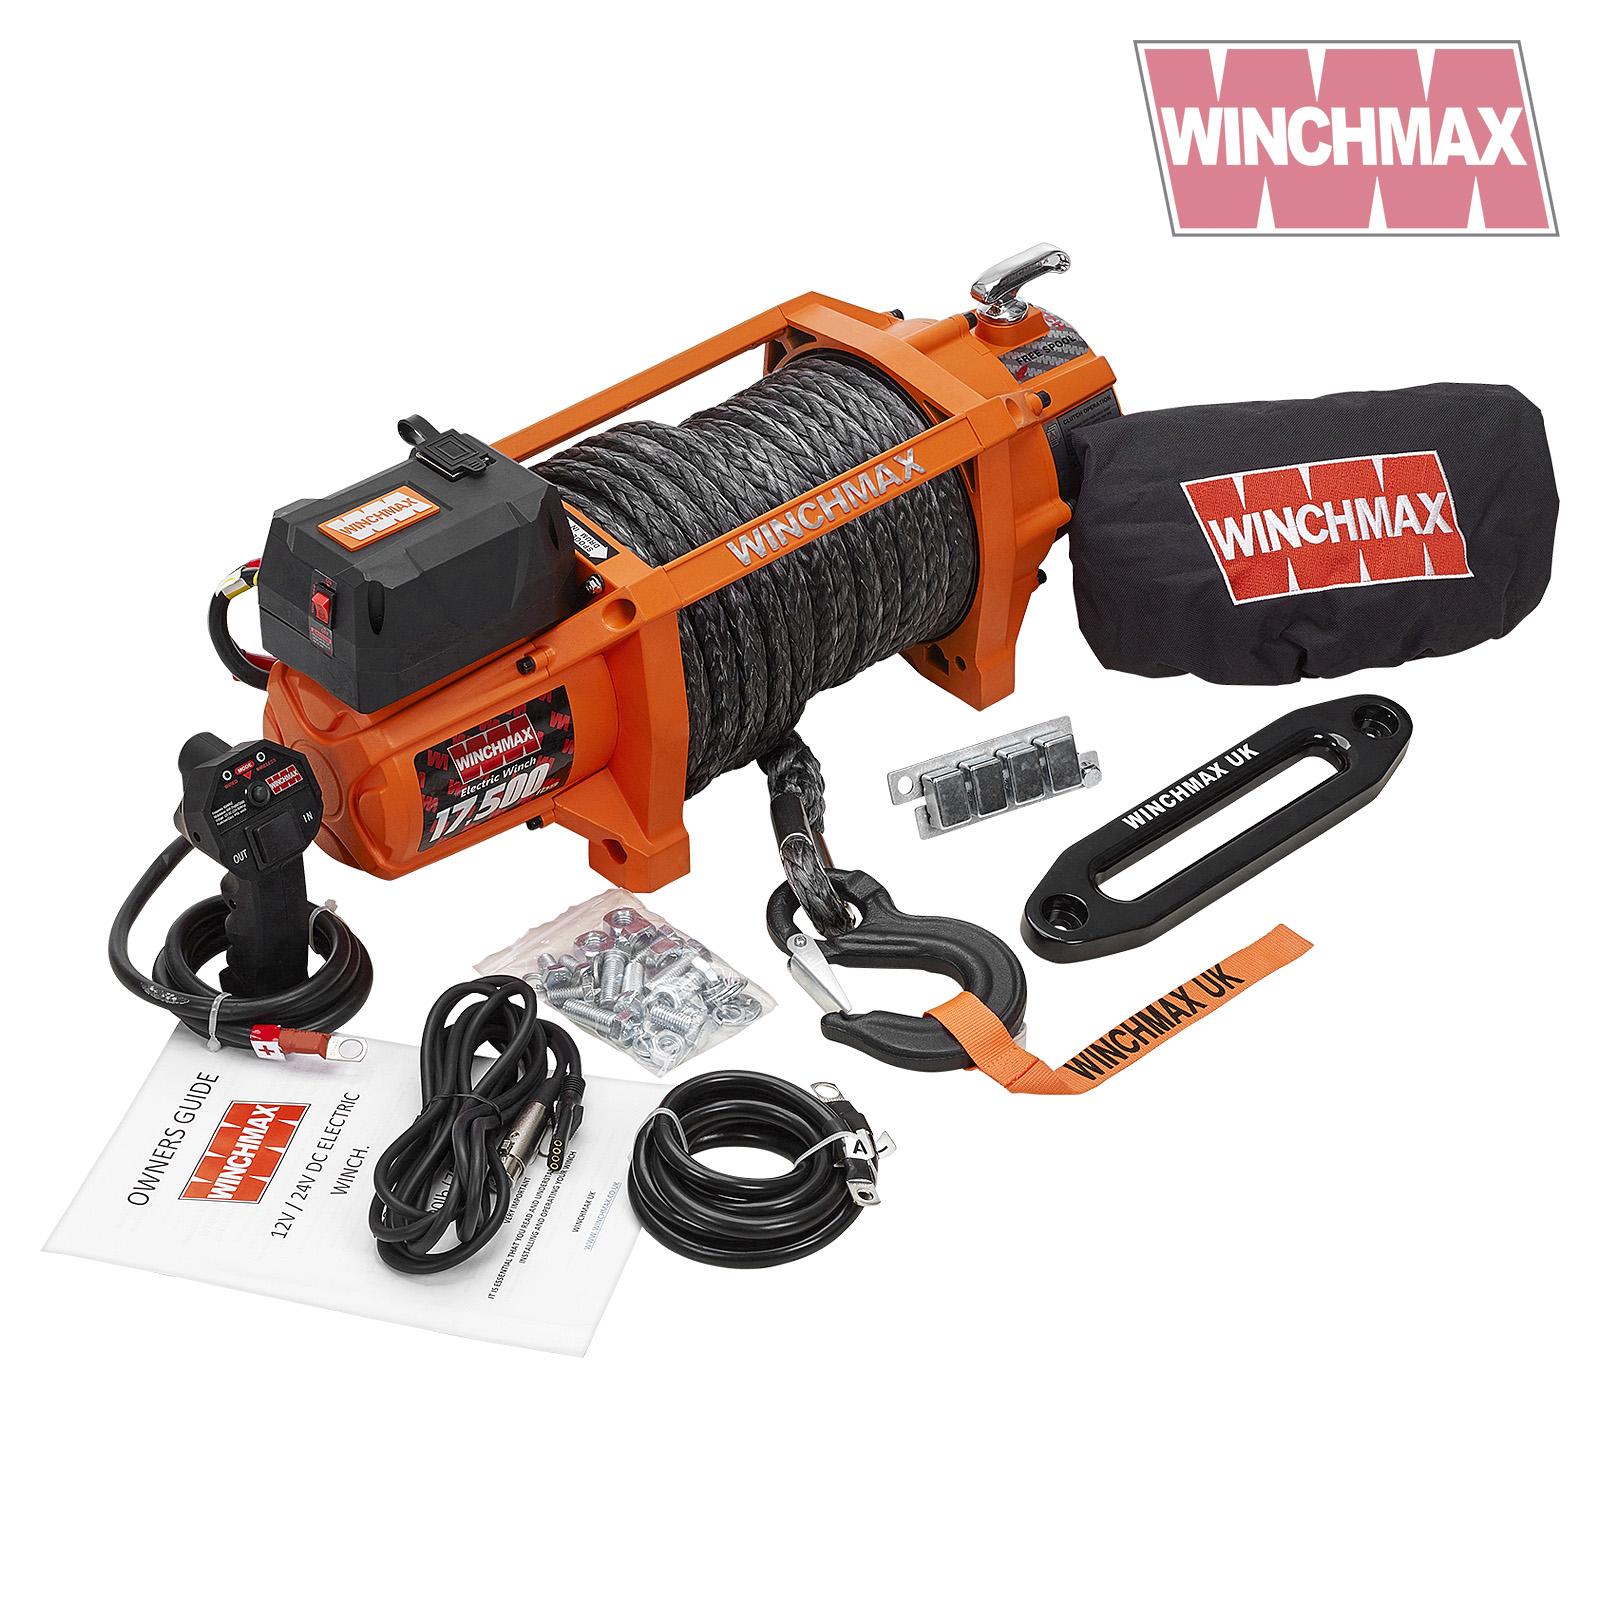 Wmsl1750012vsyn winchmax615198962 voltage removed white 15